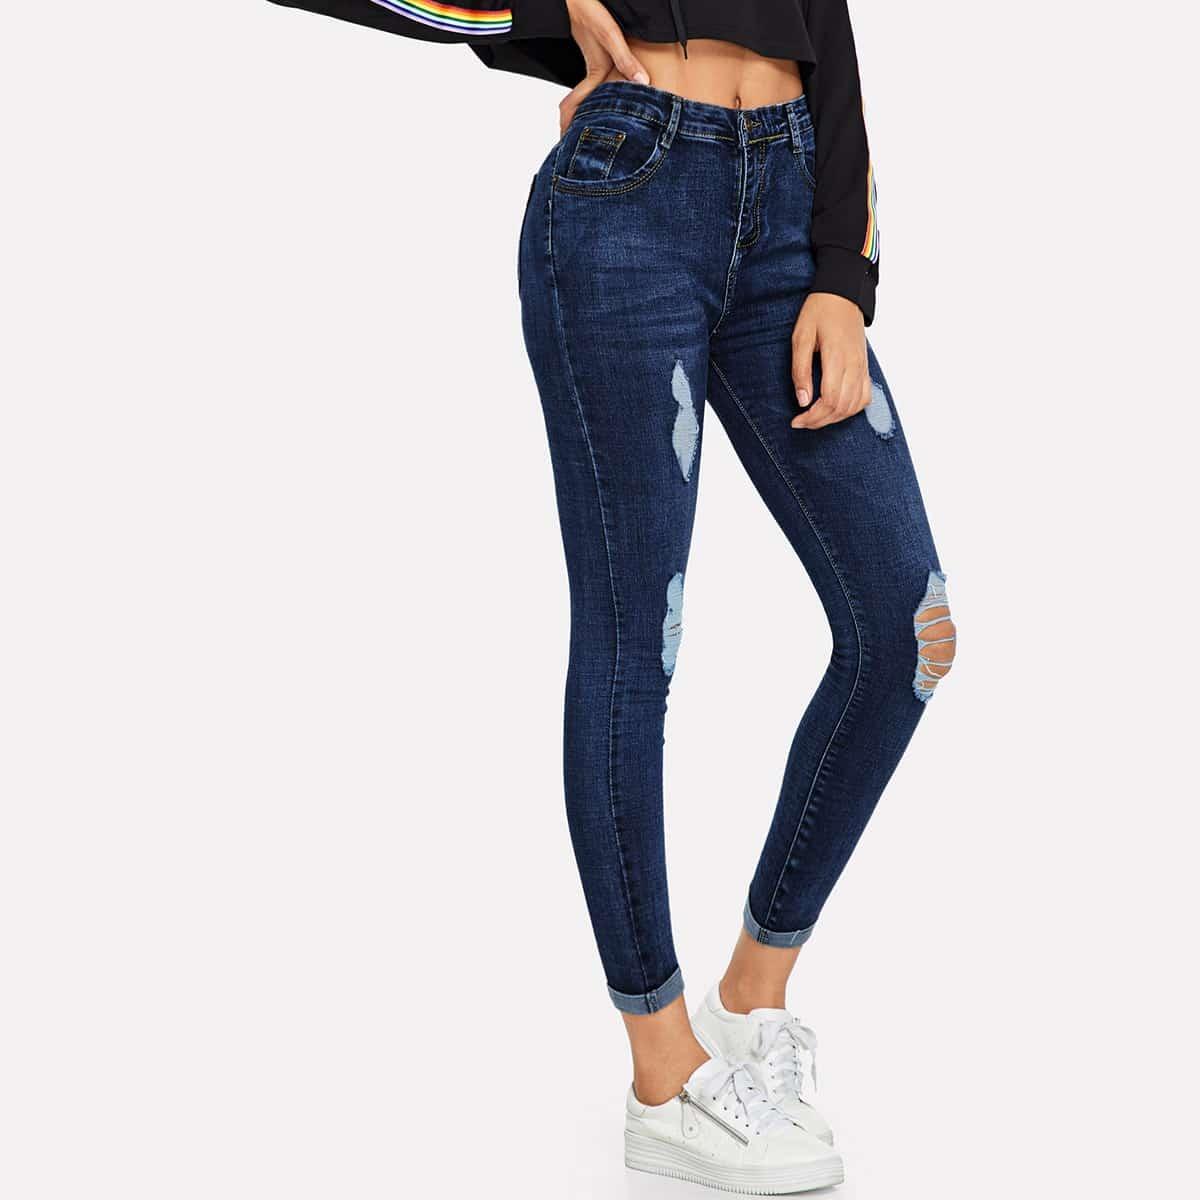 Blauw Casual Vlak jeans Knoop